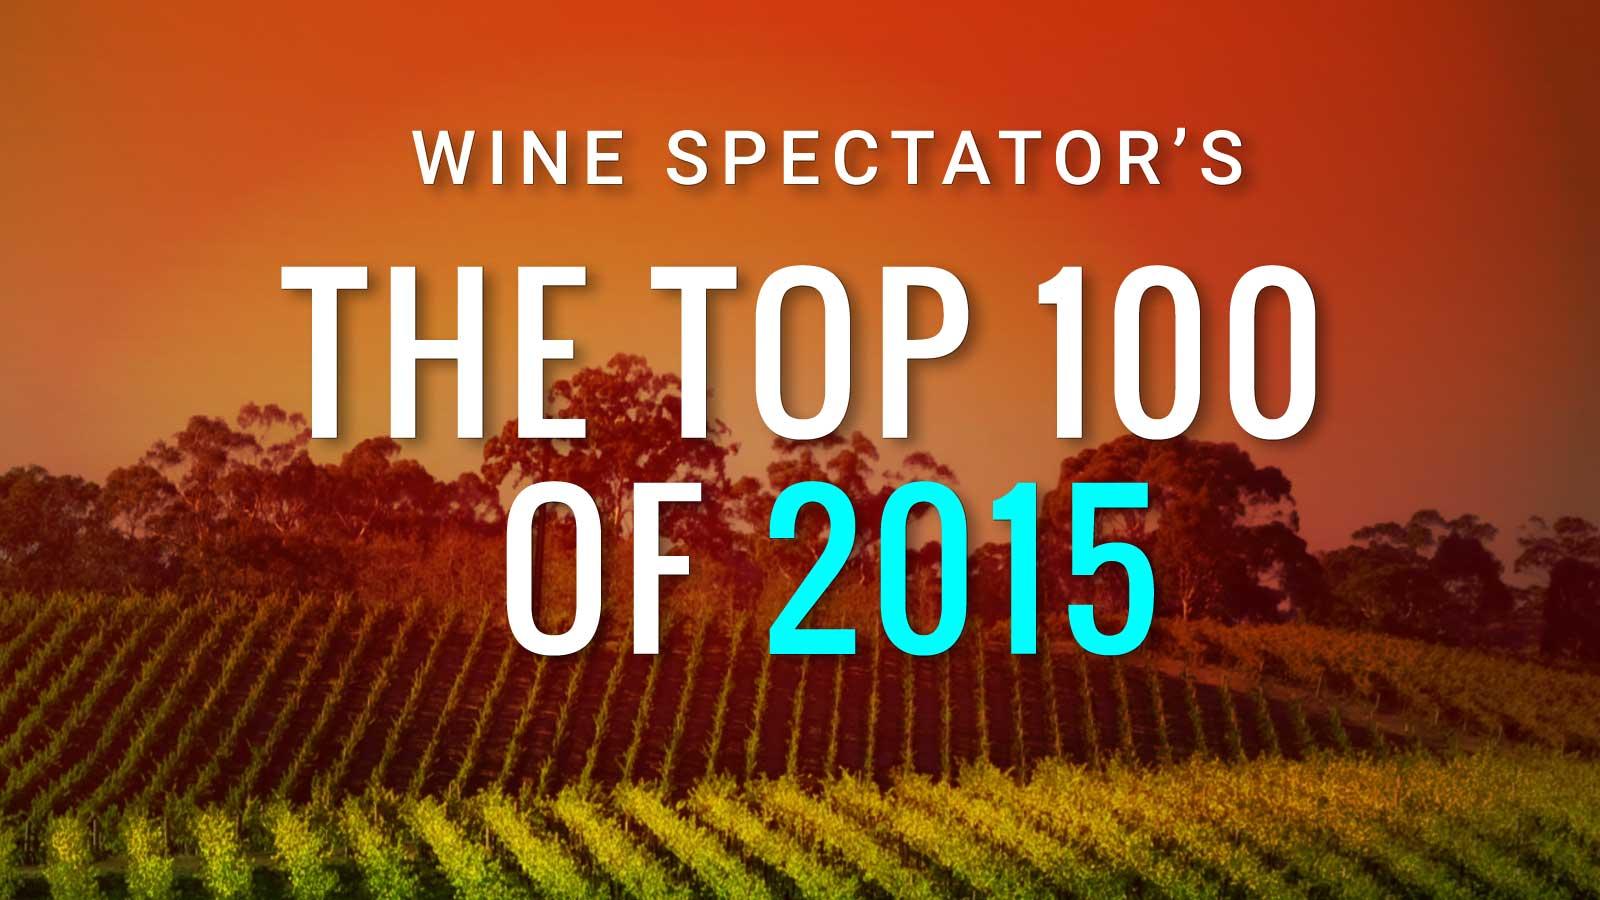 wine spectator 2015, top 100 2015, best wines of the world, top 100 wines of the world, best portuguese wines